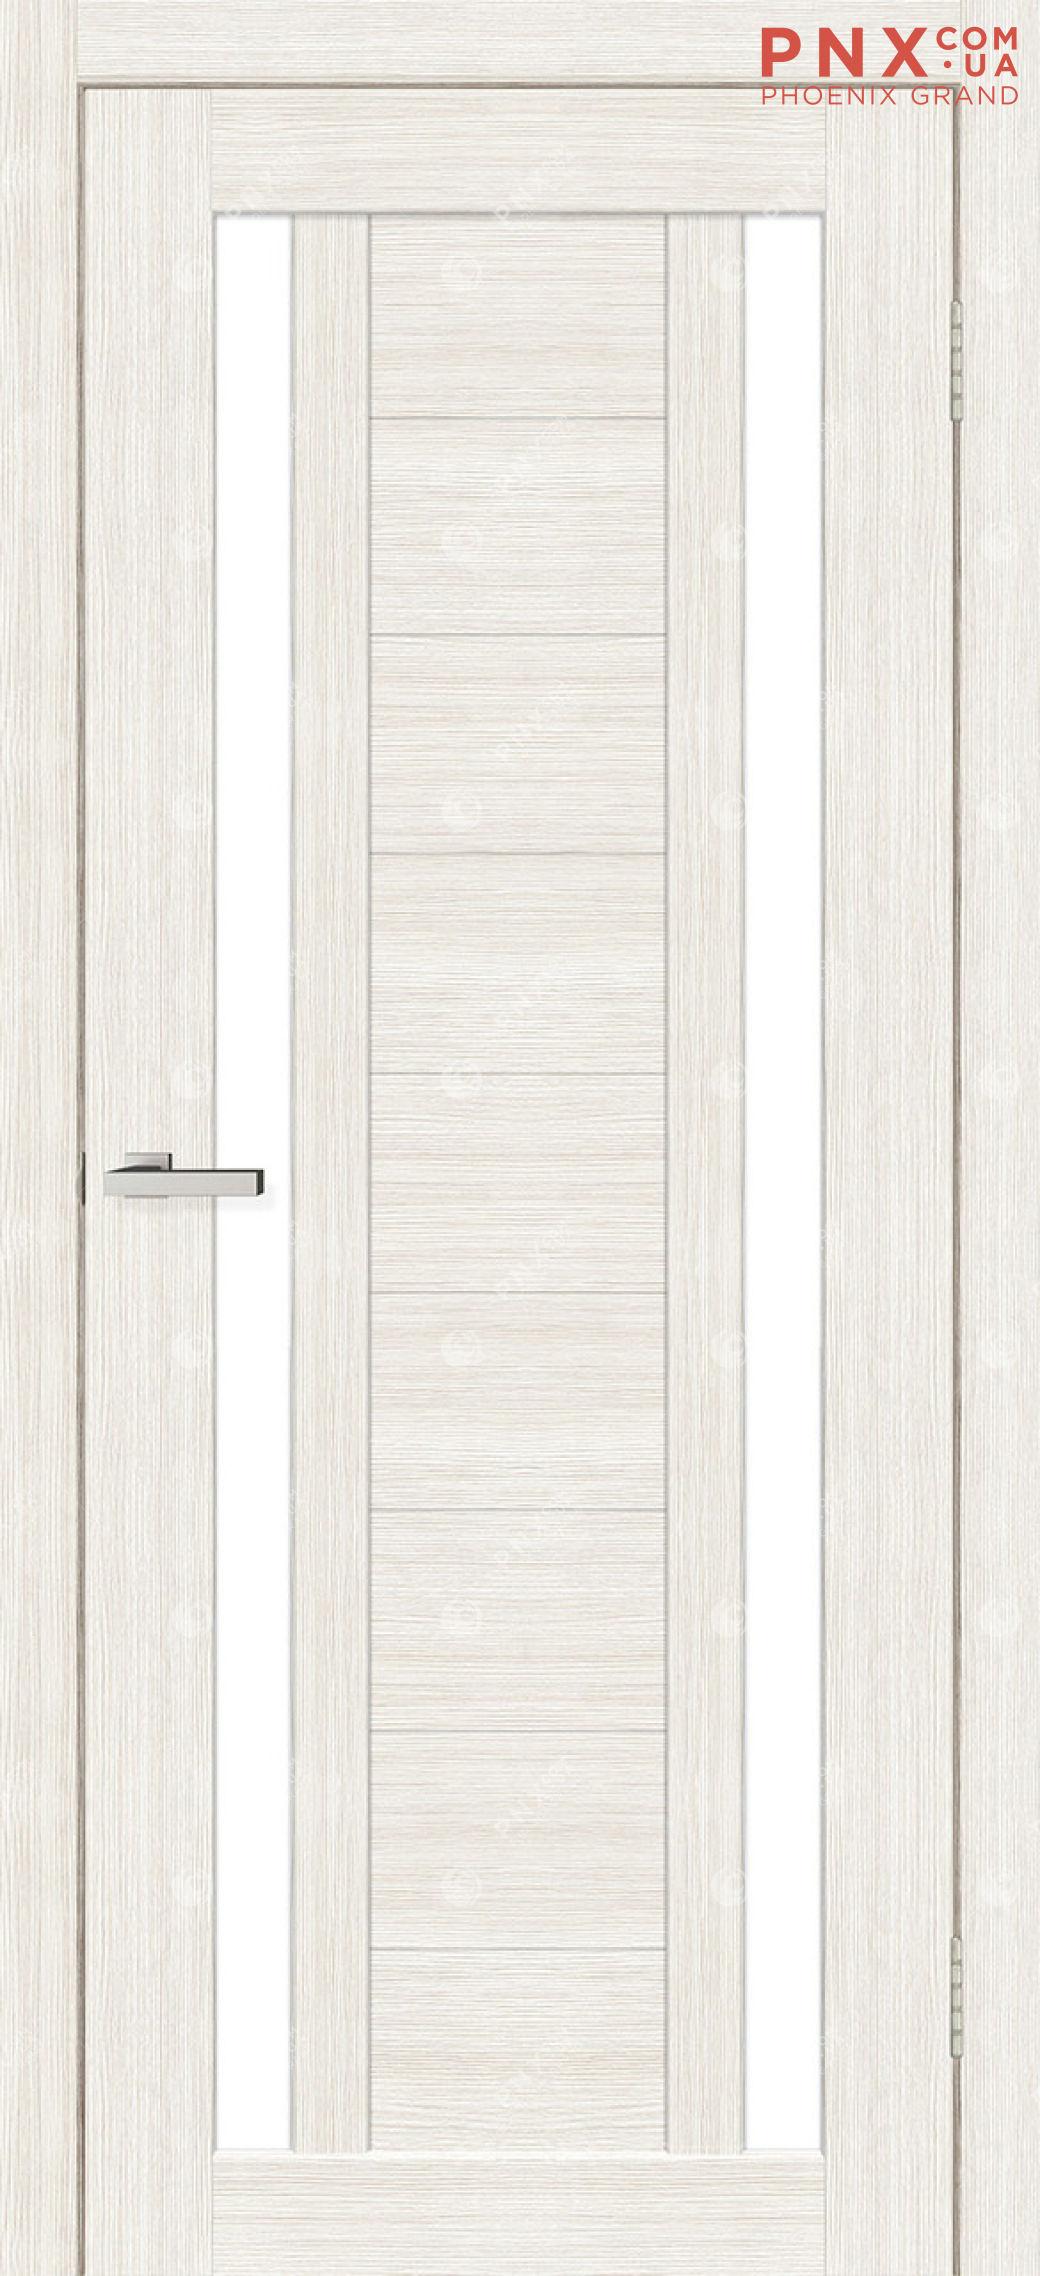 Межкомнатная дверь, , Cortex Deco 02, дуб bianco, стекло сатин